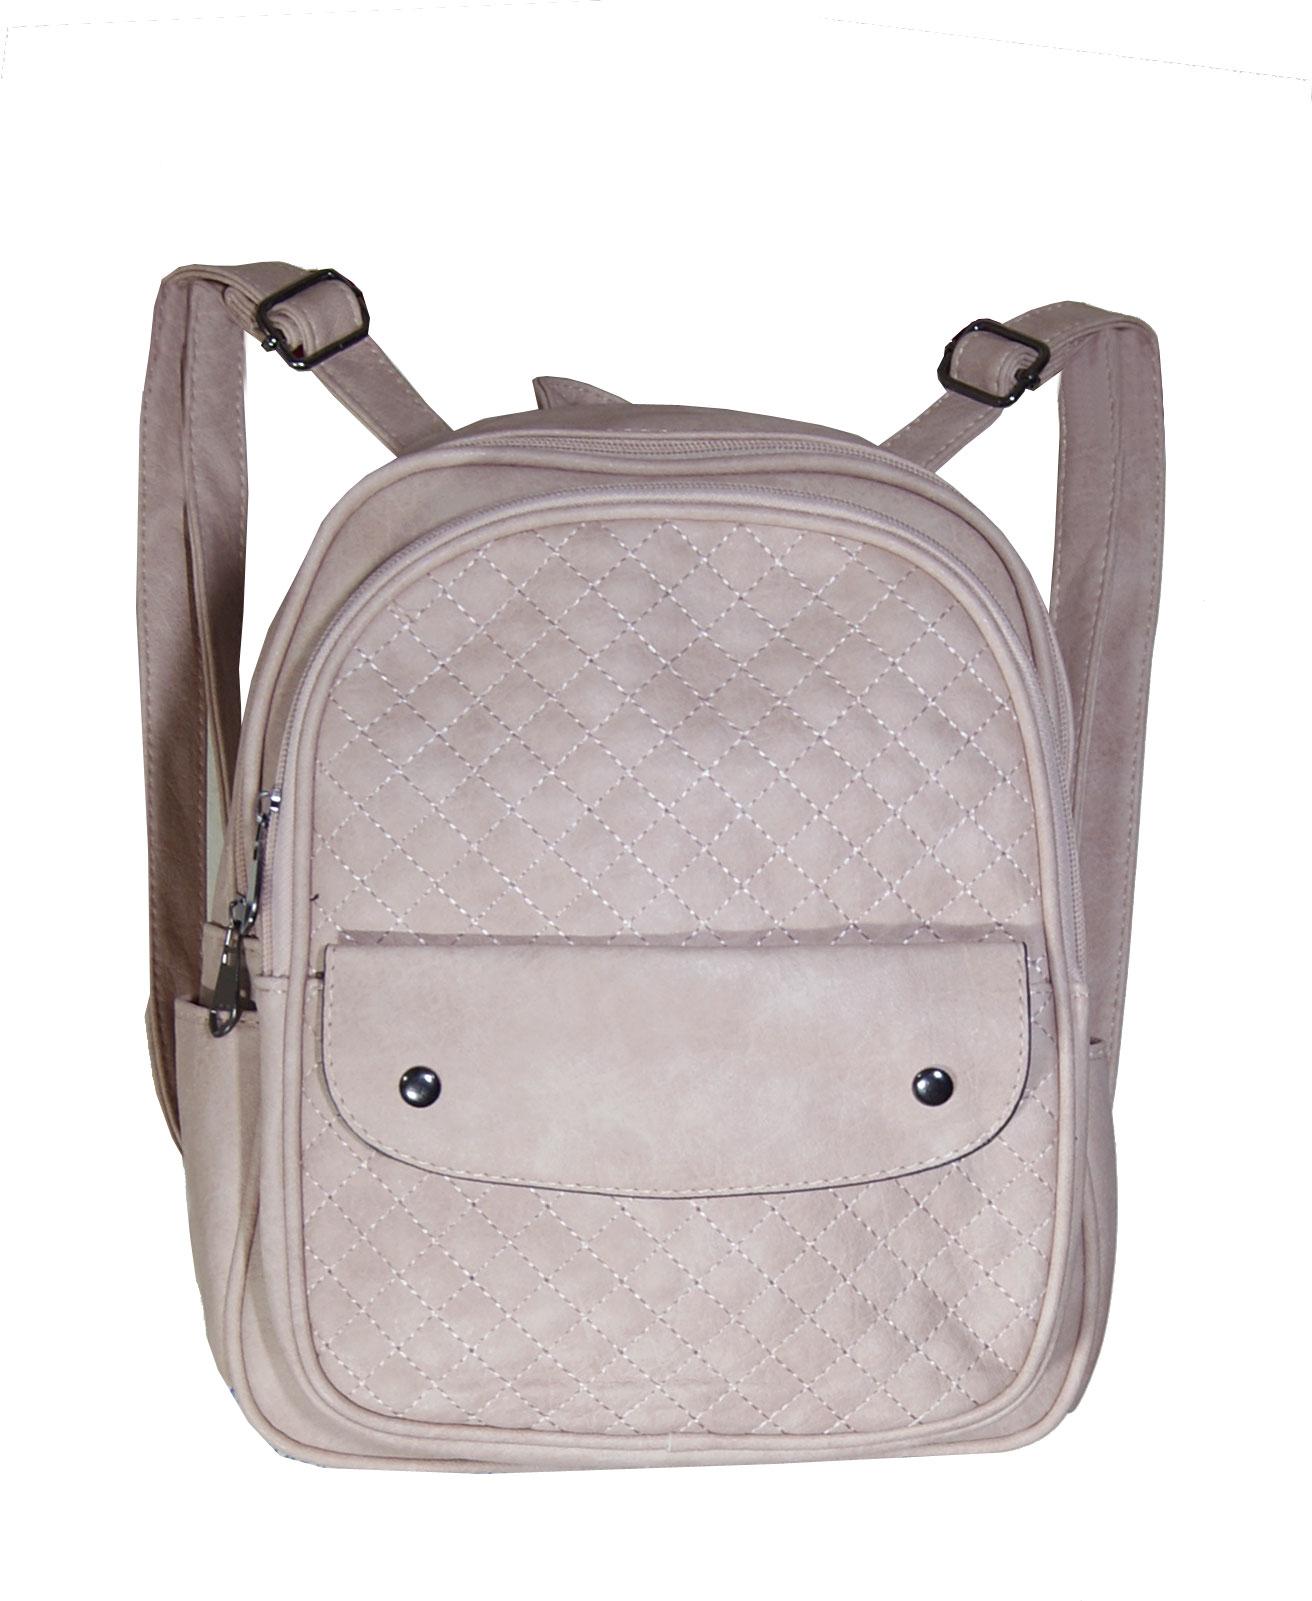 Backpack No 453 - Σάπιο μήλο (Silvio κωδ.: 453)